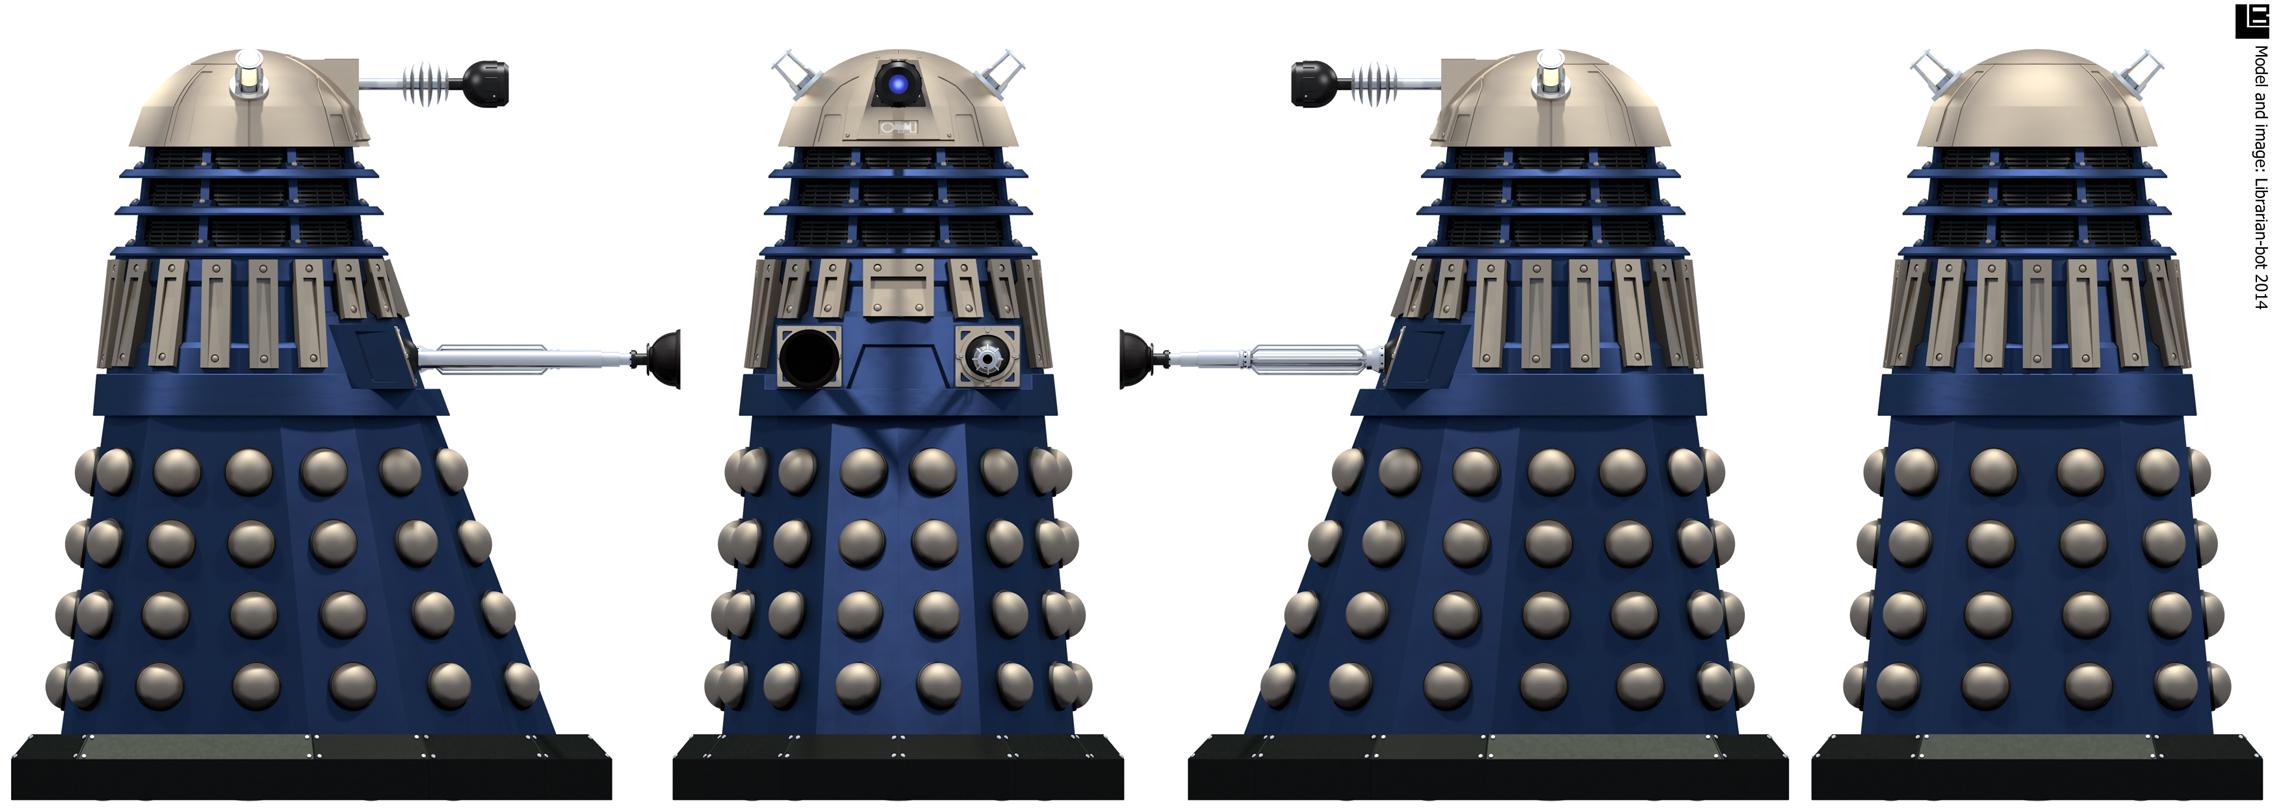 Time War Eternity Circle Dalek by Librarian-bot on DeviantArt